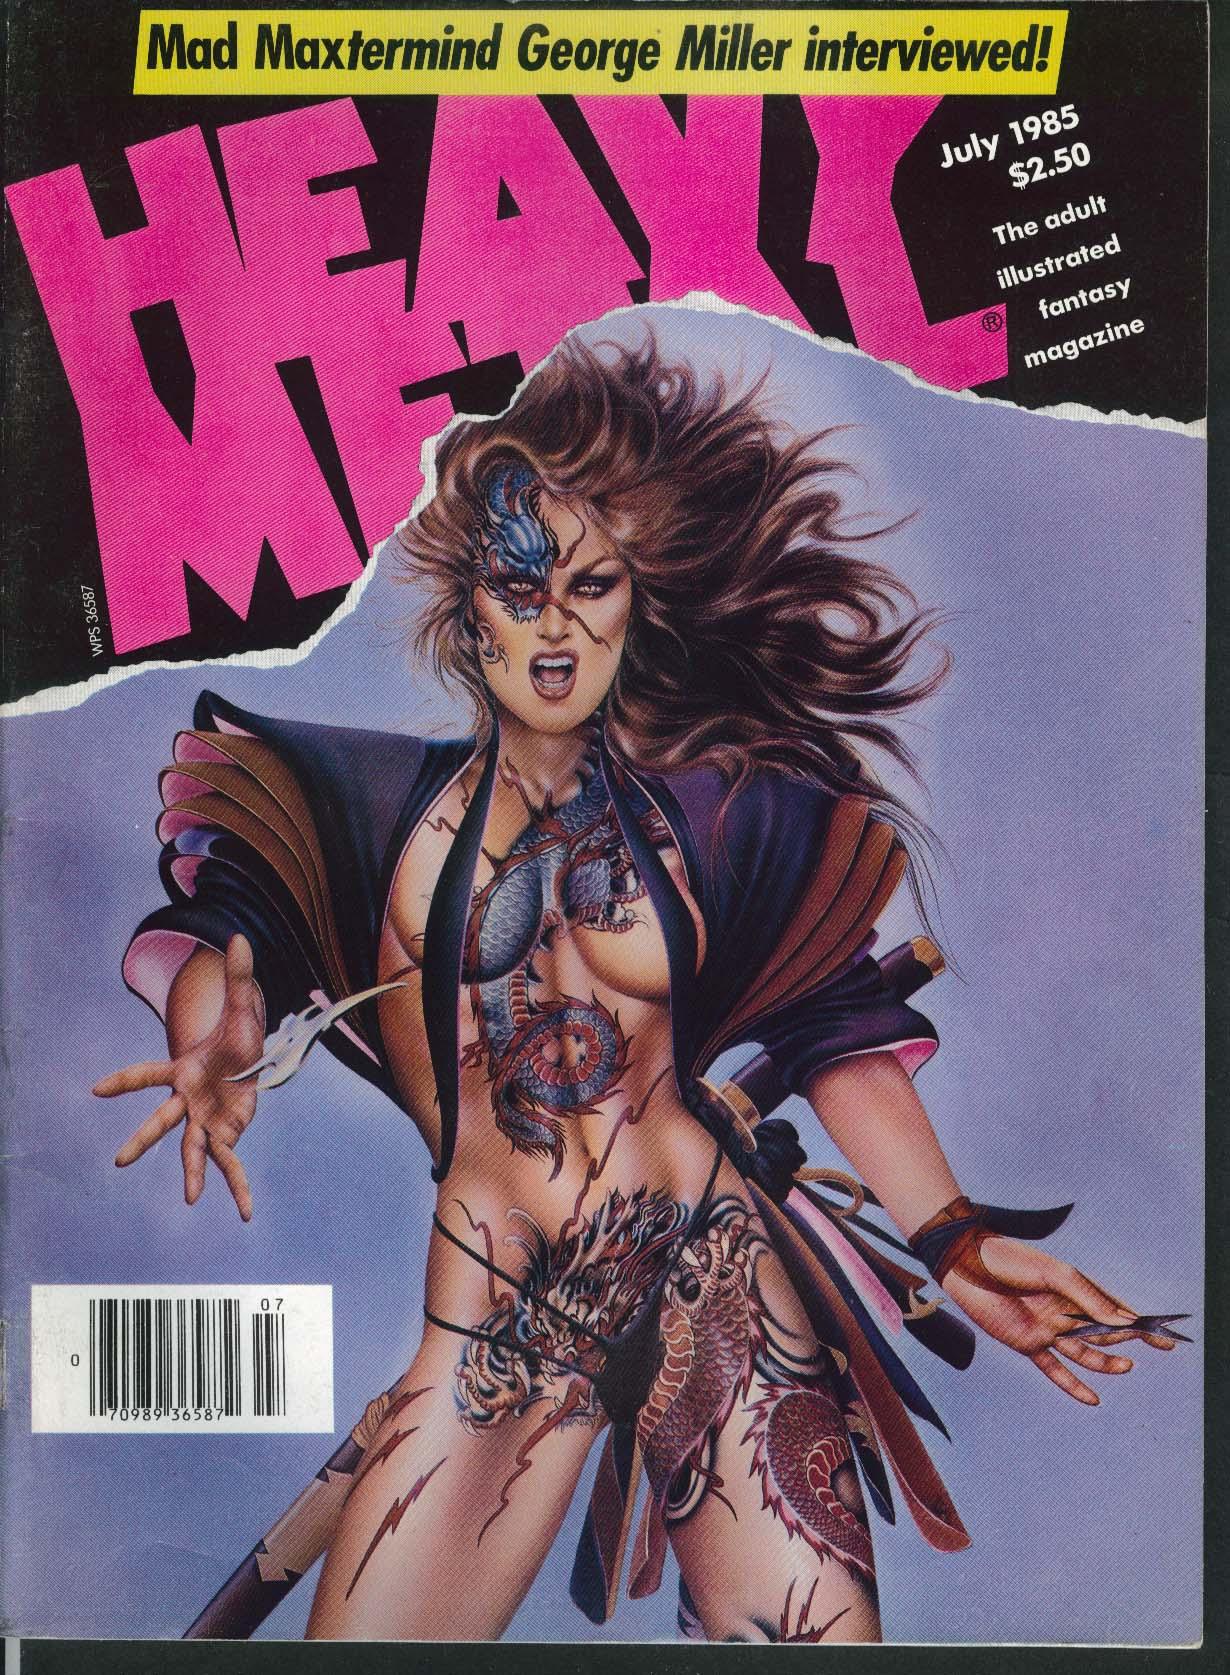 HEAVY METAL Mad Max George Miller Richard Corben Voss Rod Kierkegaard 7 1985